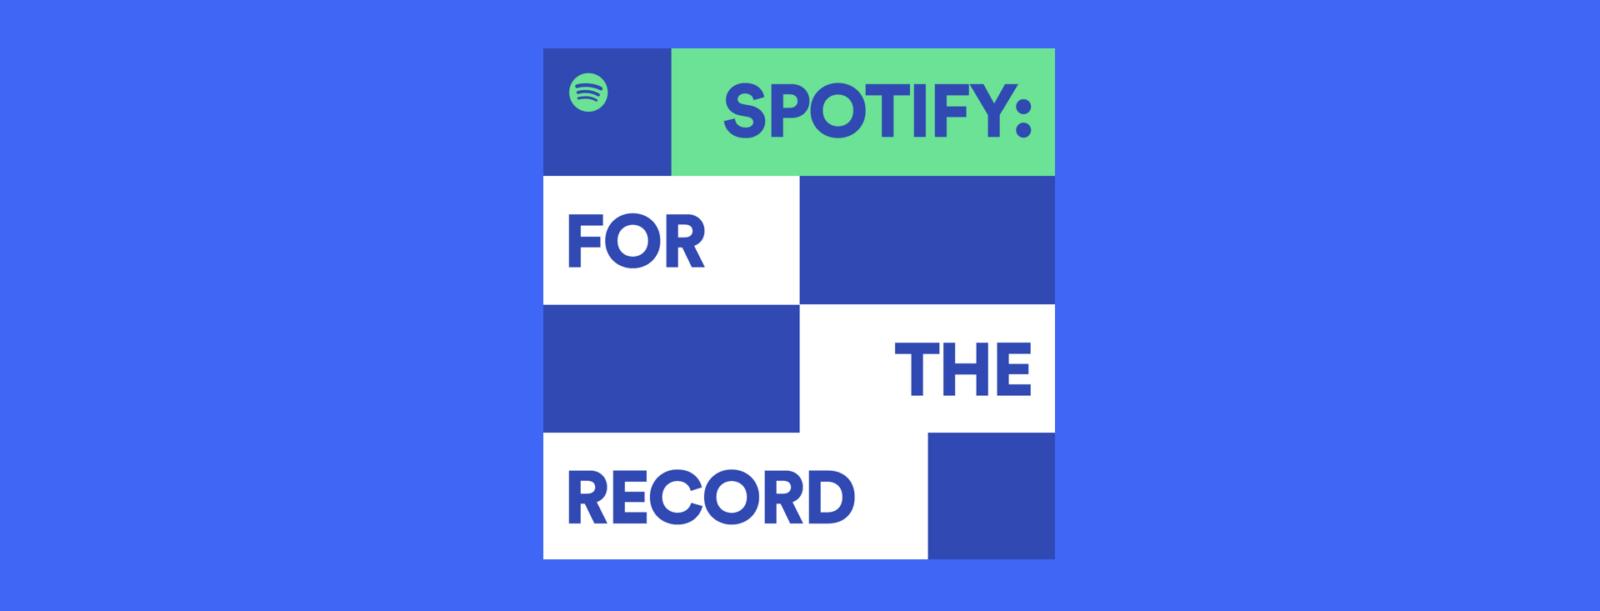 Ftr Podcast Story Header.png